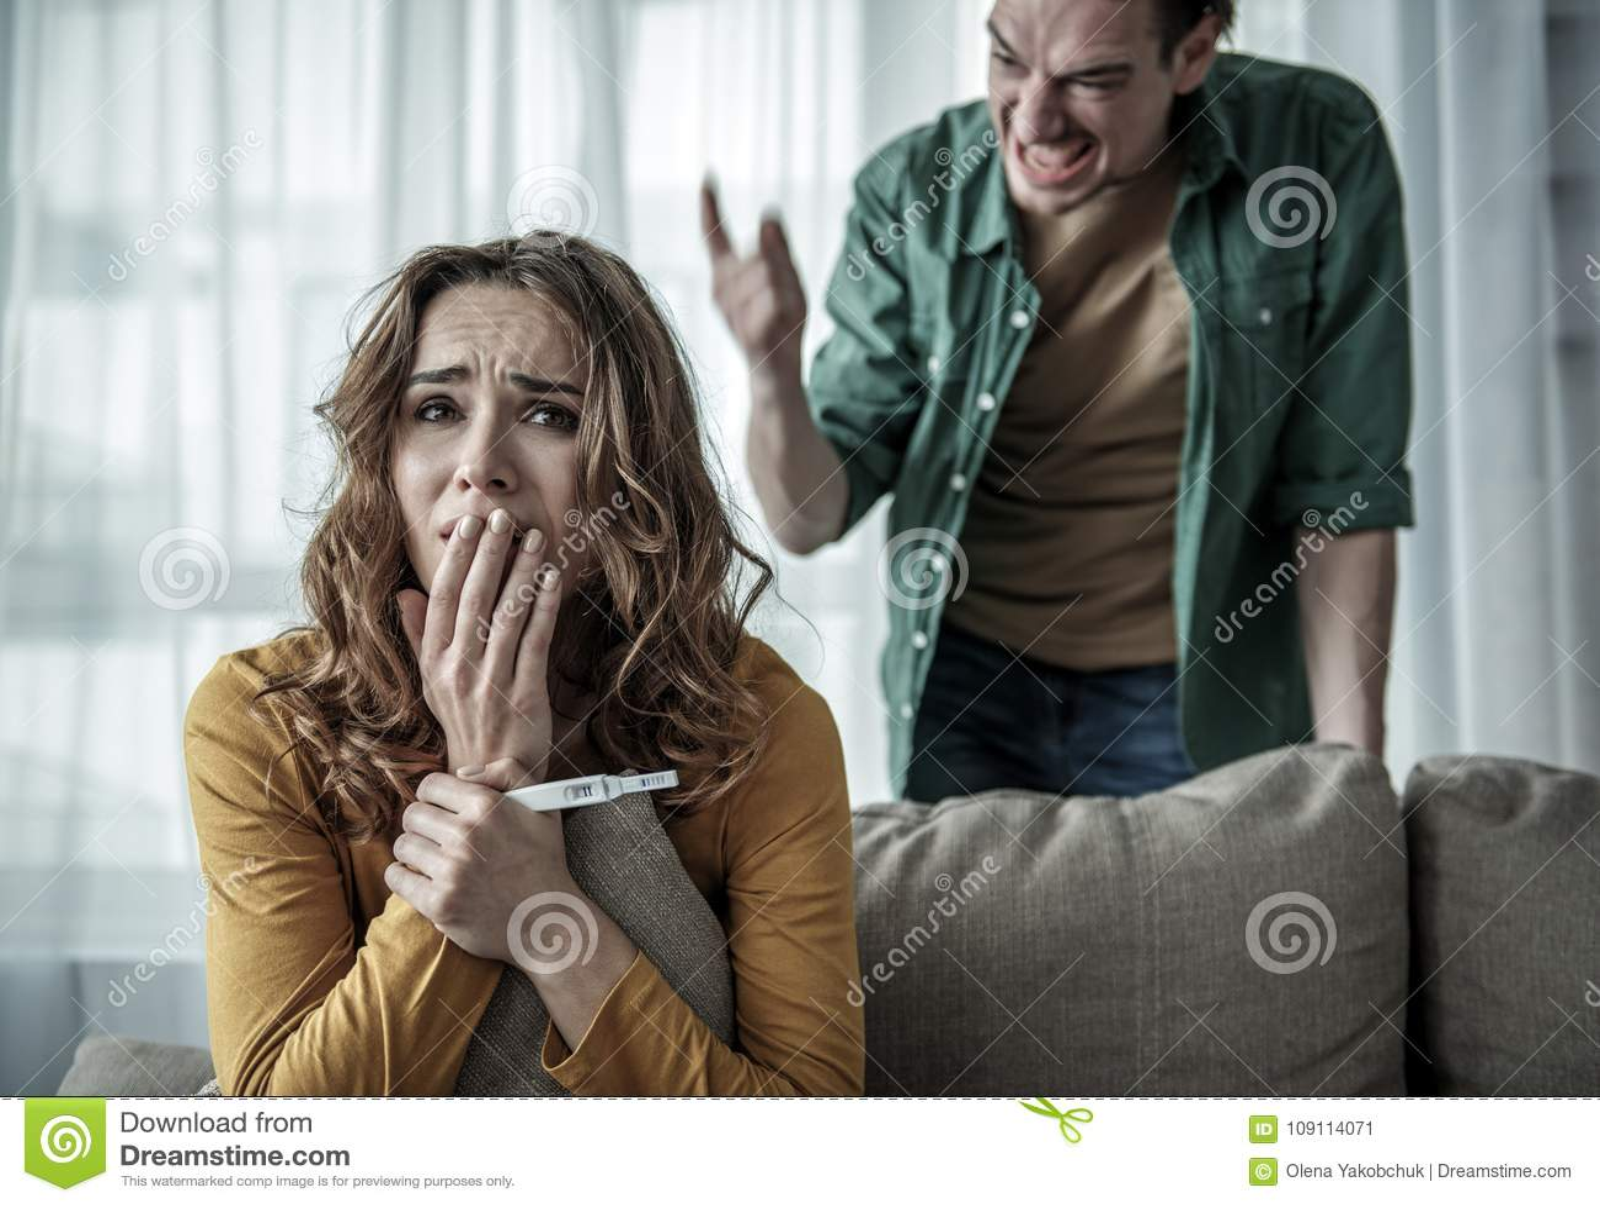 Irritated Man Shouting At Pregnant Woman Stock Image